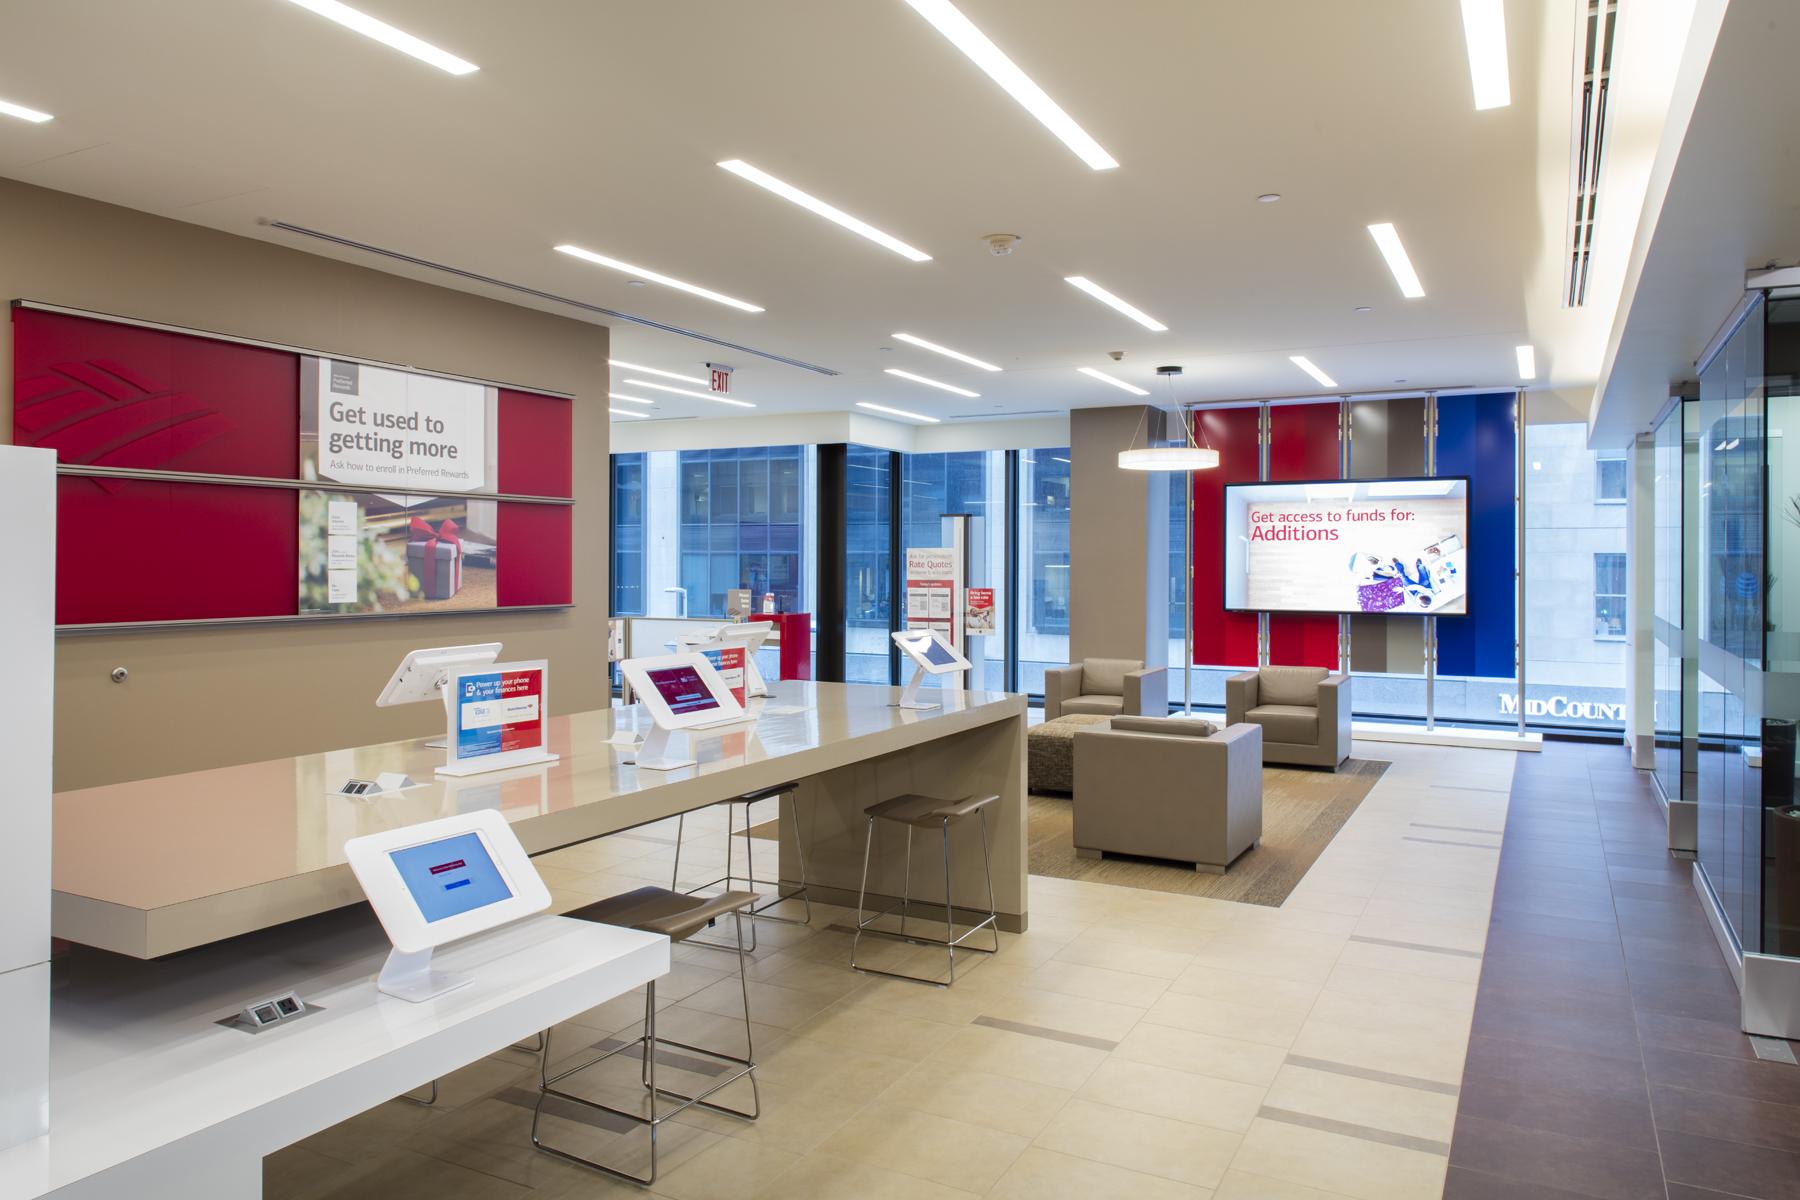 Bank of America lobby.